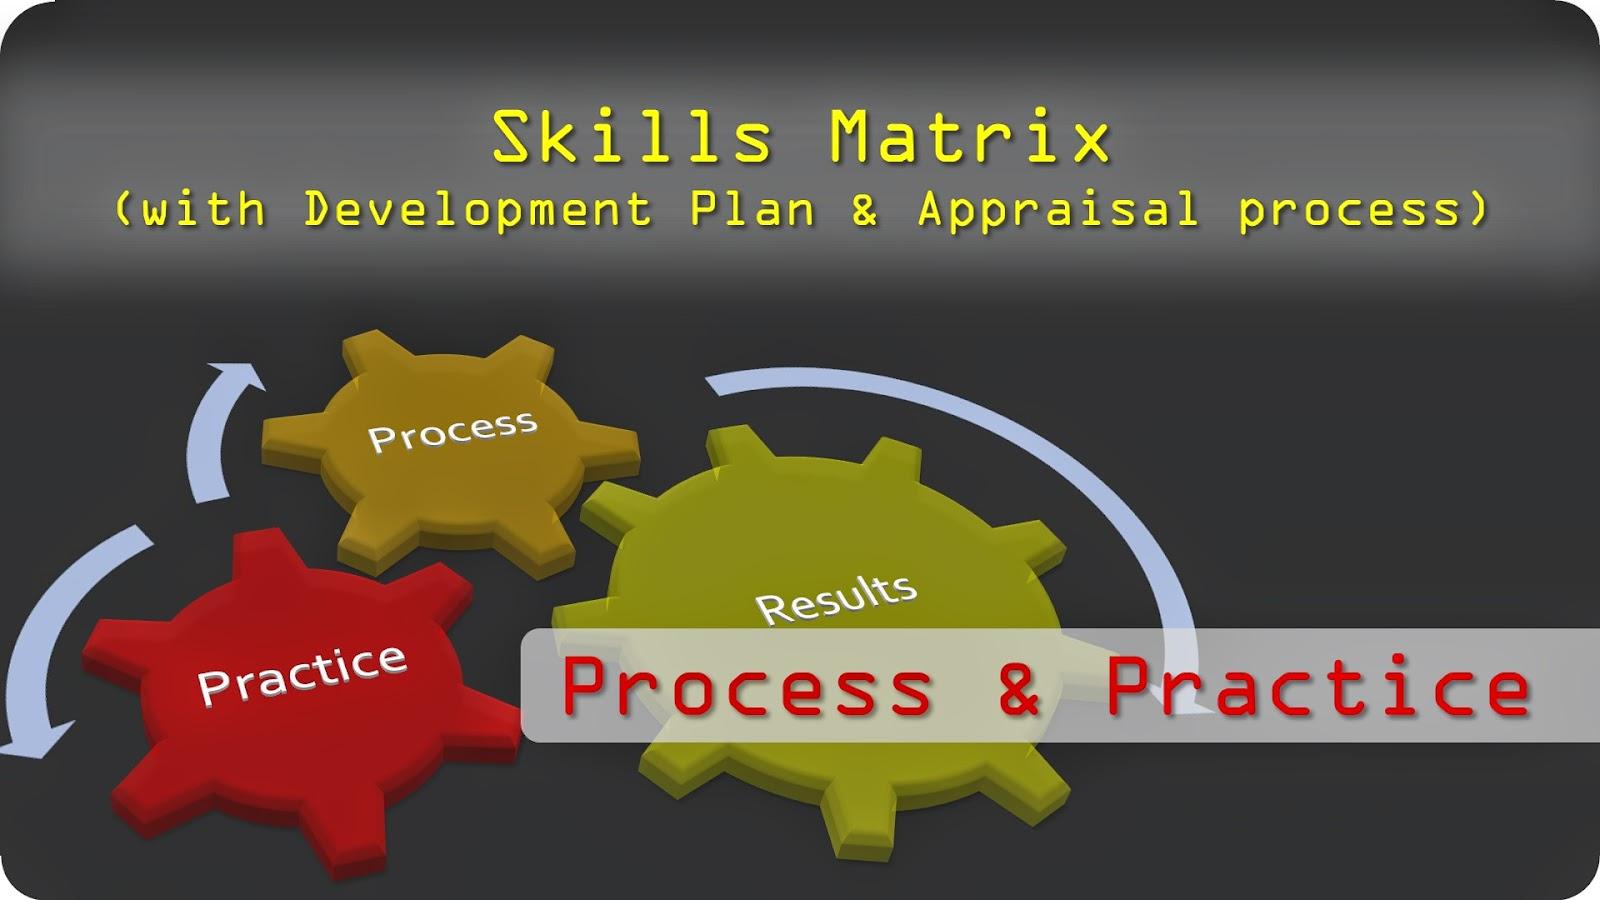 Introducing the GDS digital and technology skills matrix